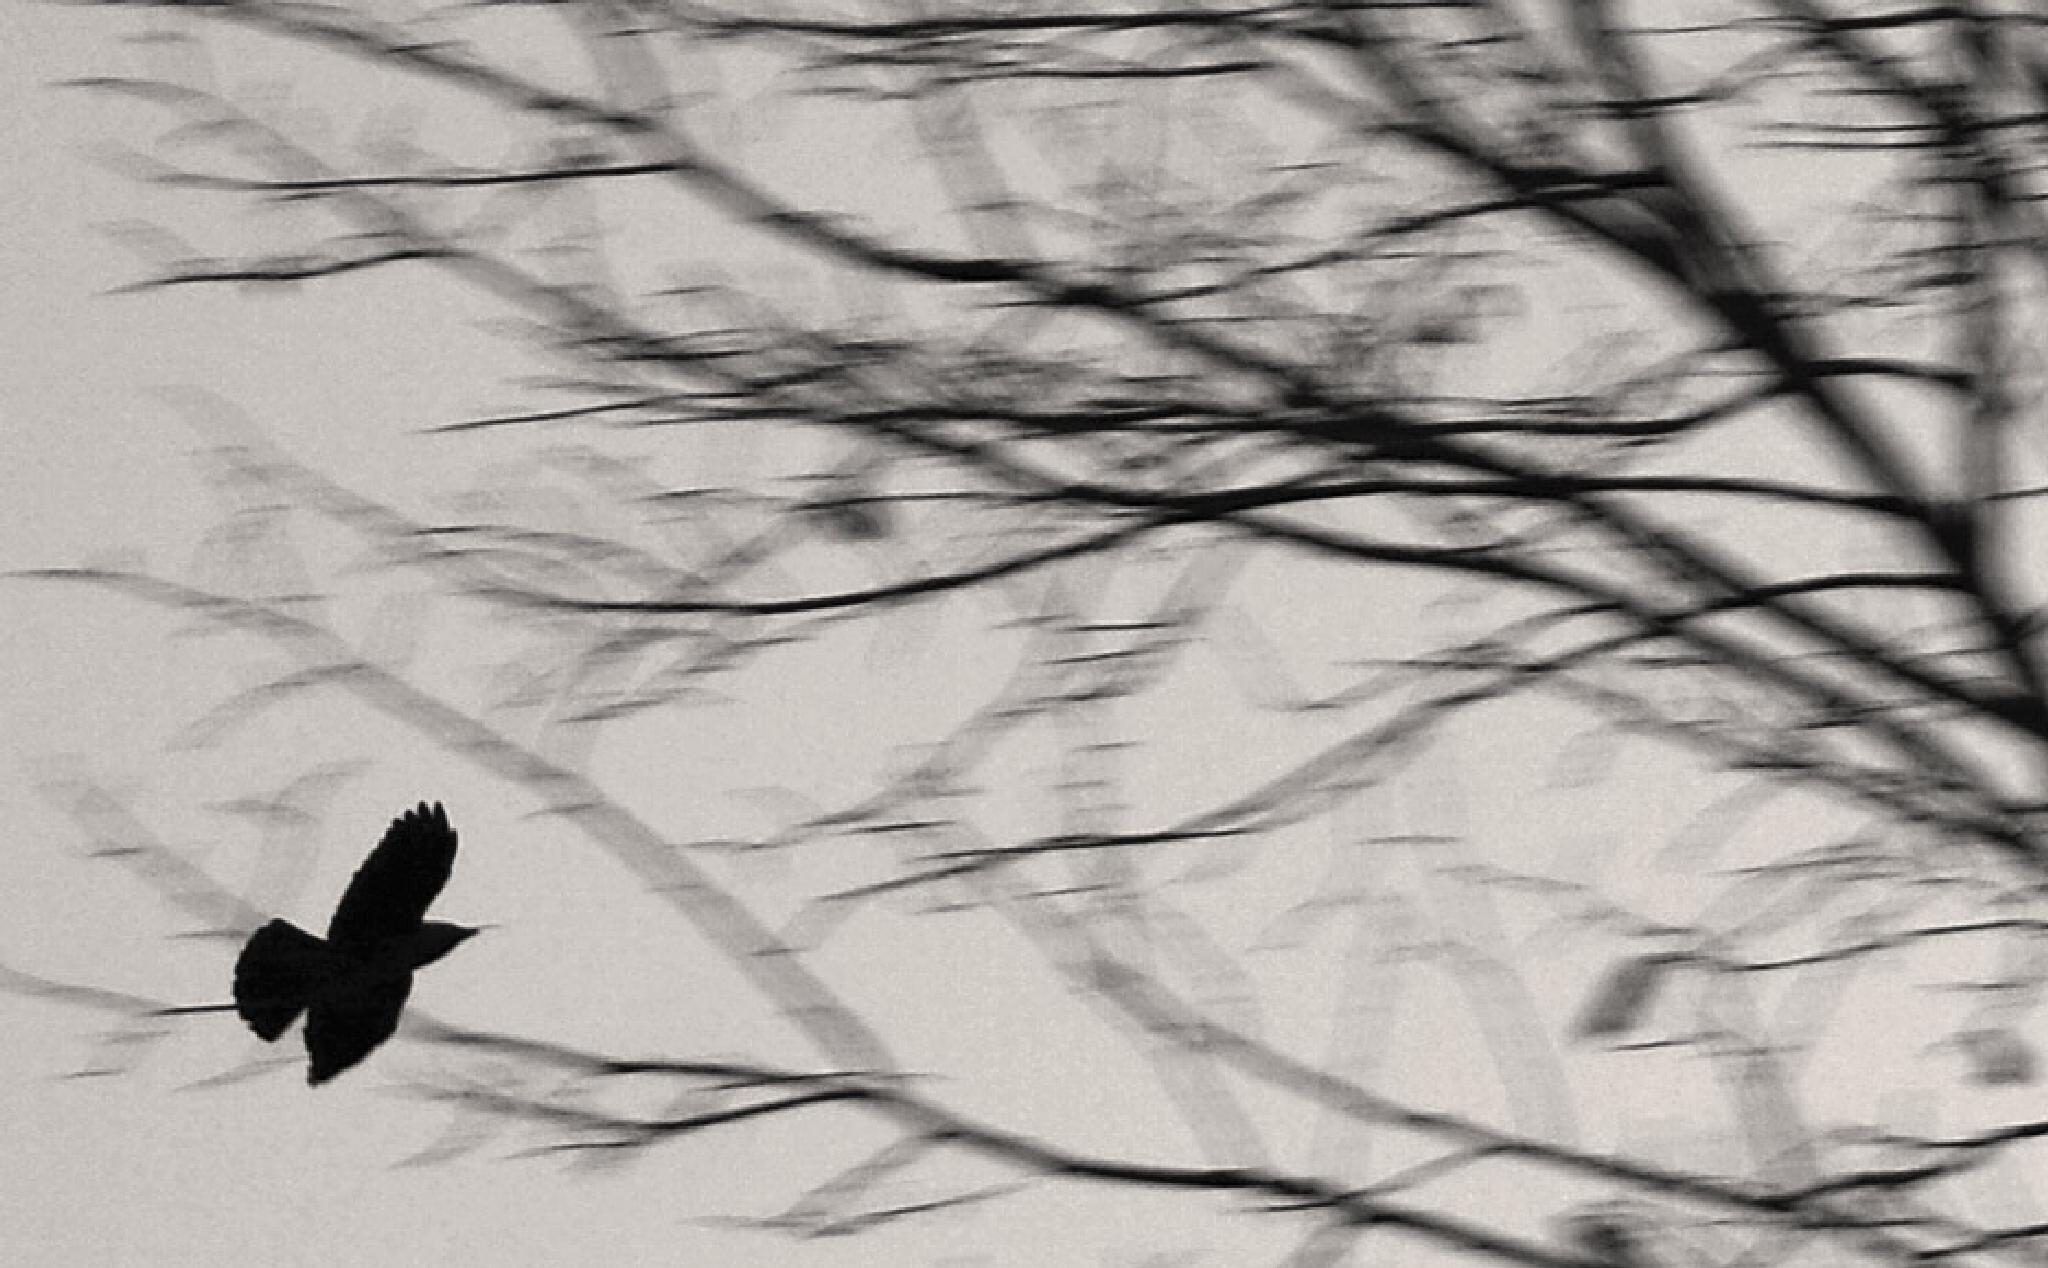 Flying Away by Heljä Kostiainen